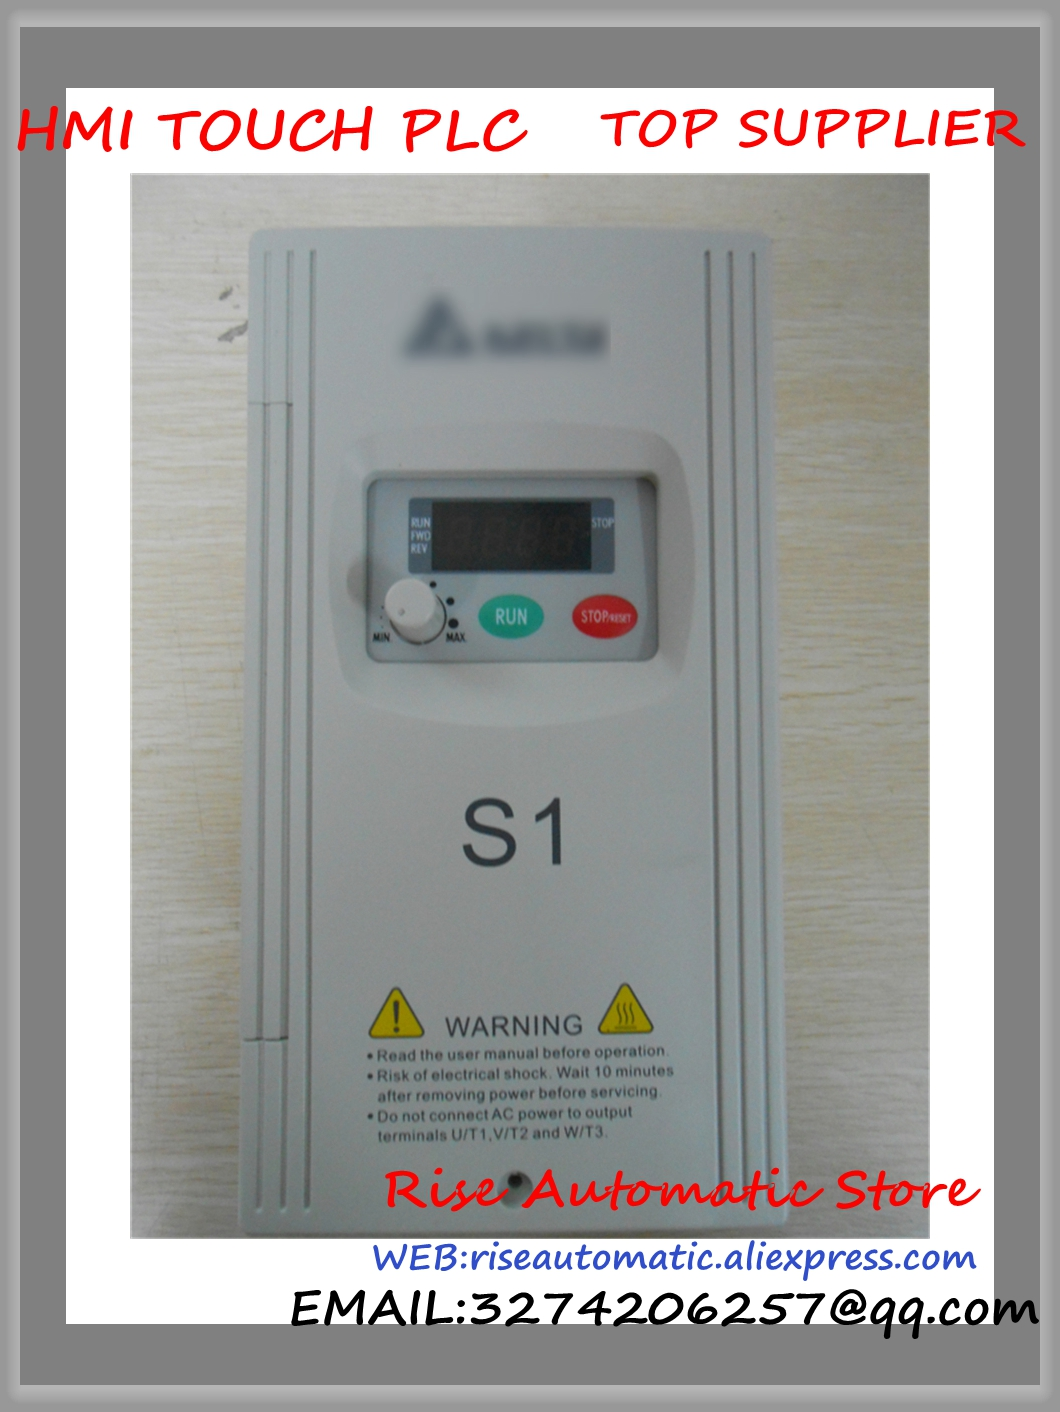 VFD-S Inverter AC motor drive 3 phase 220V 400W 0.5HP 2.5A 400HZ new VFD004S23A Delta